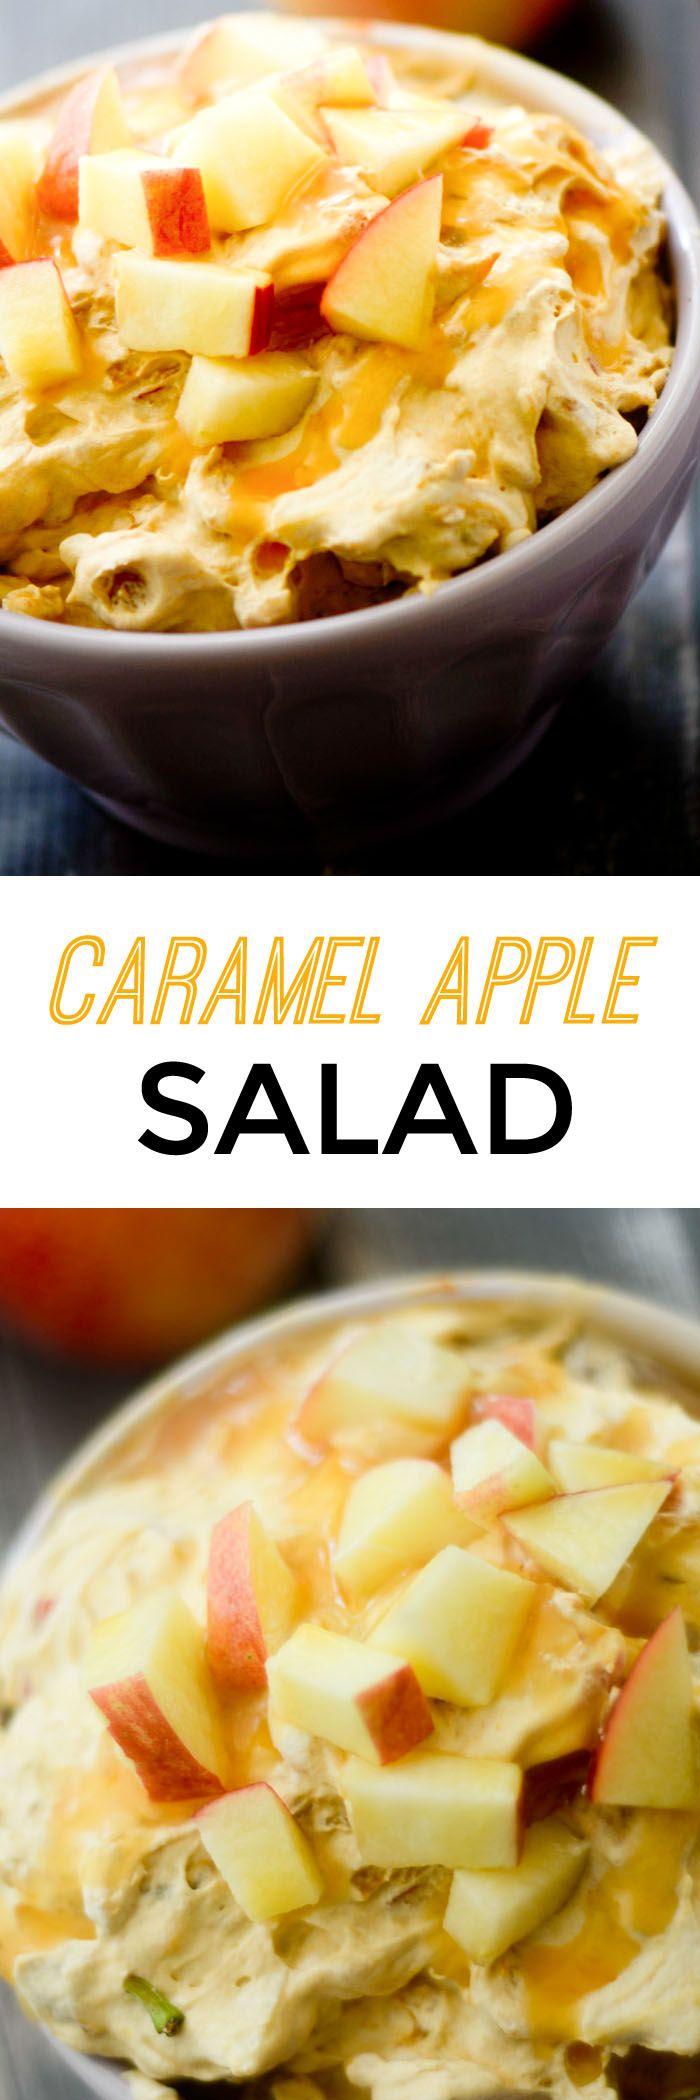 Caramel Apple Salad - Recipe Diaries